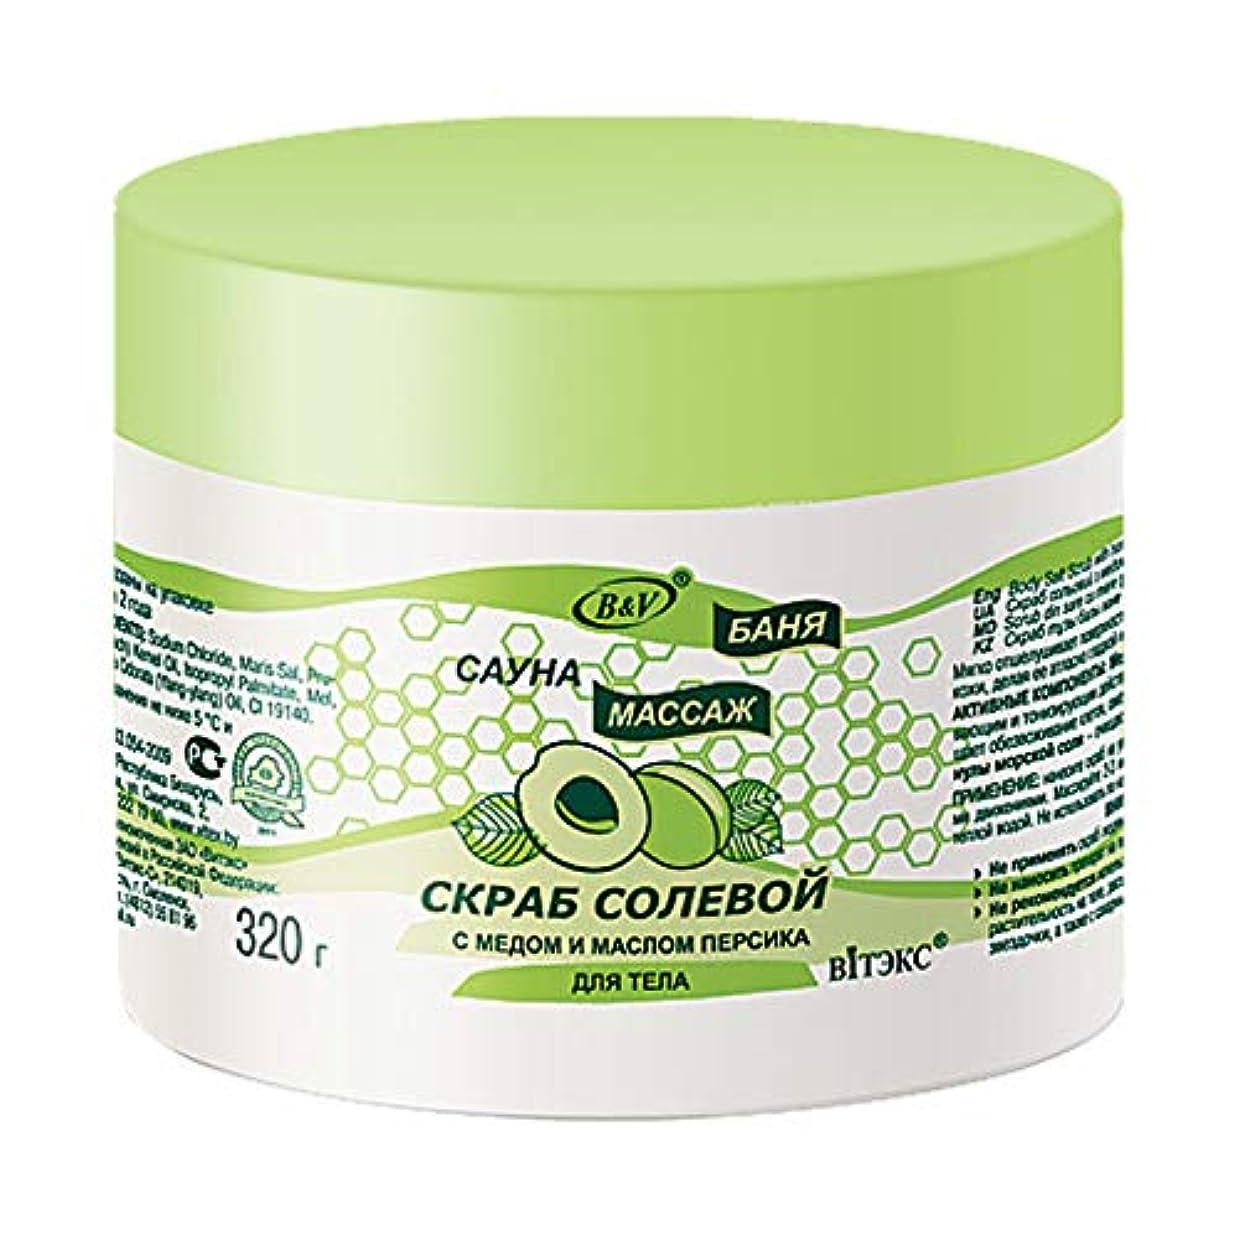 育成糸ナイロンBielita & Vitex | Bath Sauna Massage | Body Salt Scrub | Honey | Peach Oil | Sea Oil Granules | Vitamins | 320 ml